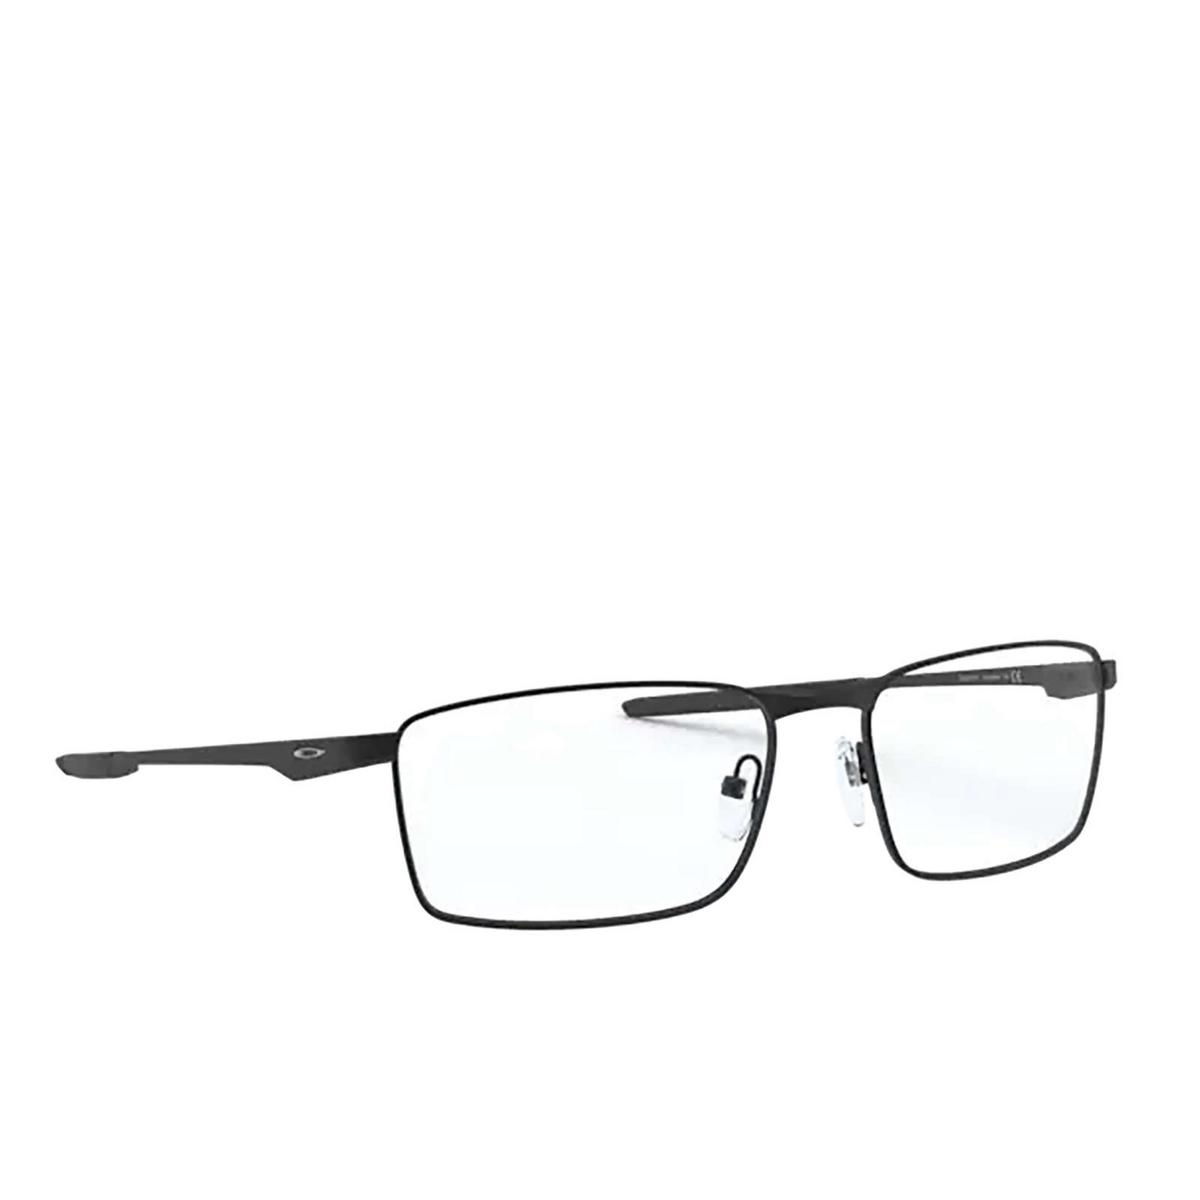 Oakley® Rectangle Eyeglasses: Fuller OX3227 color Satin Black 322701 - three-quarters view.